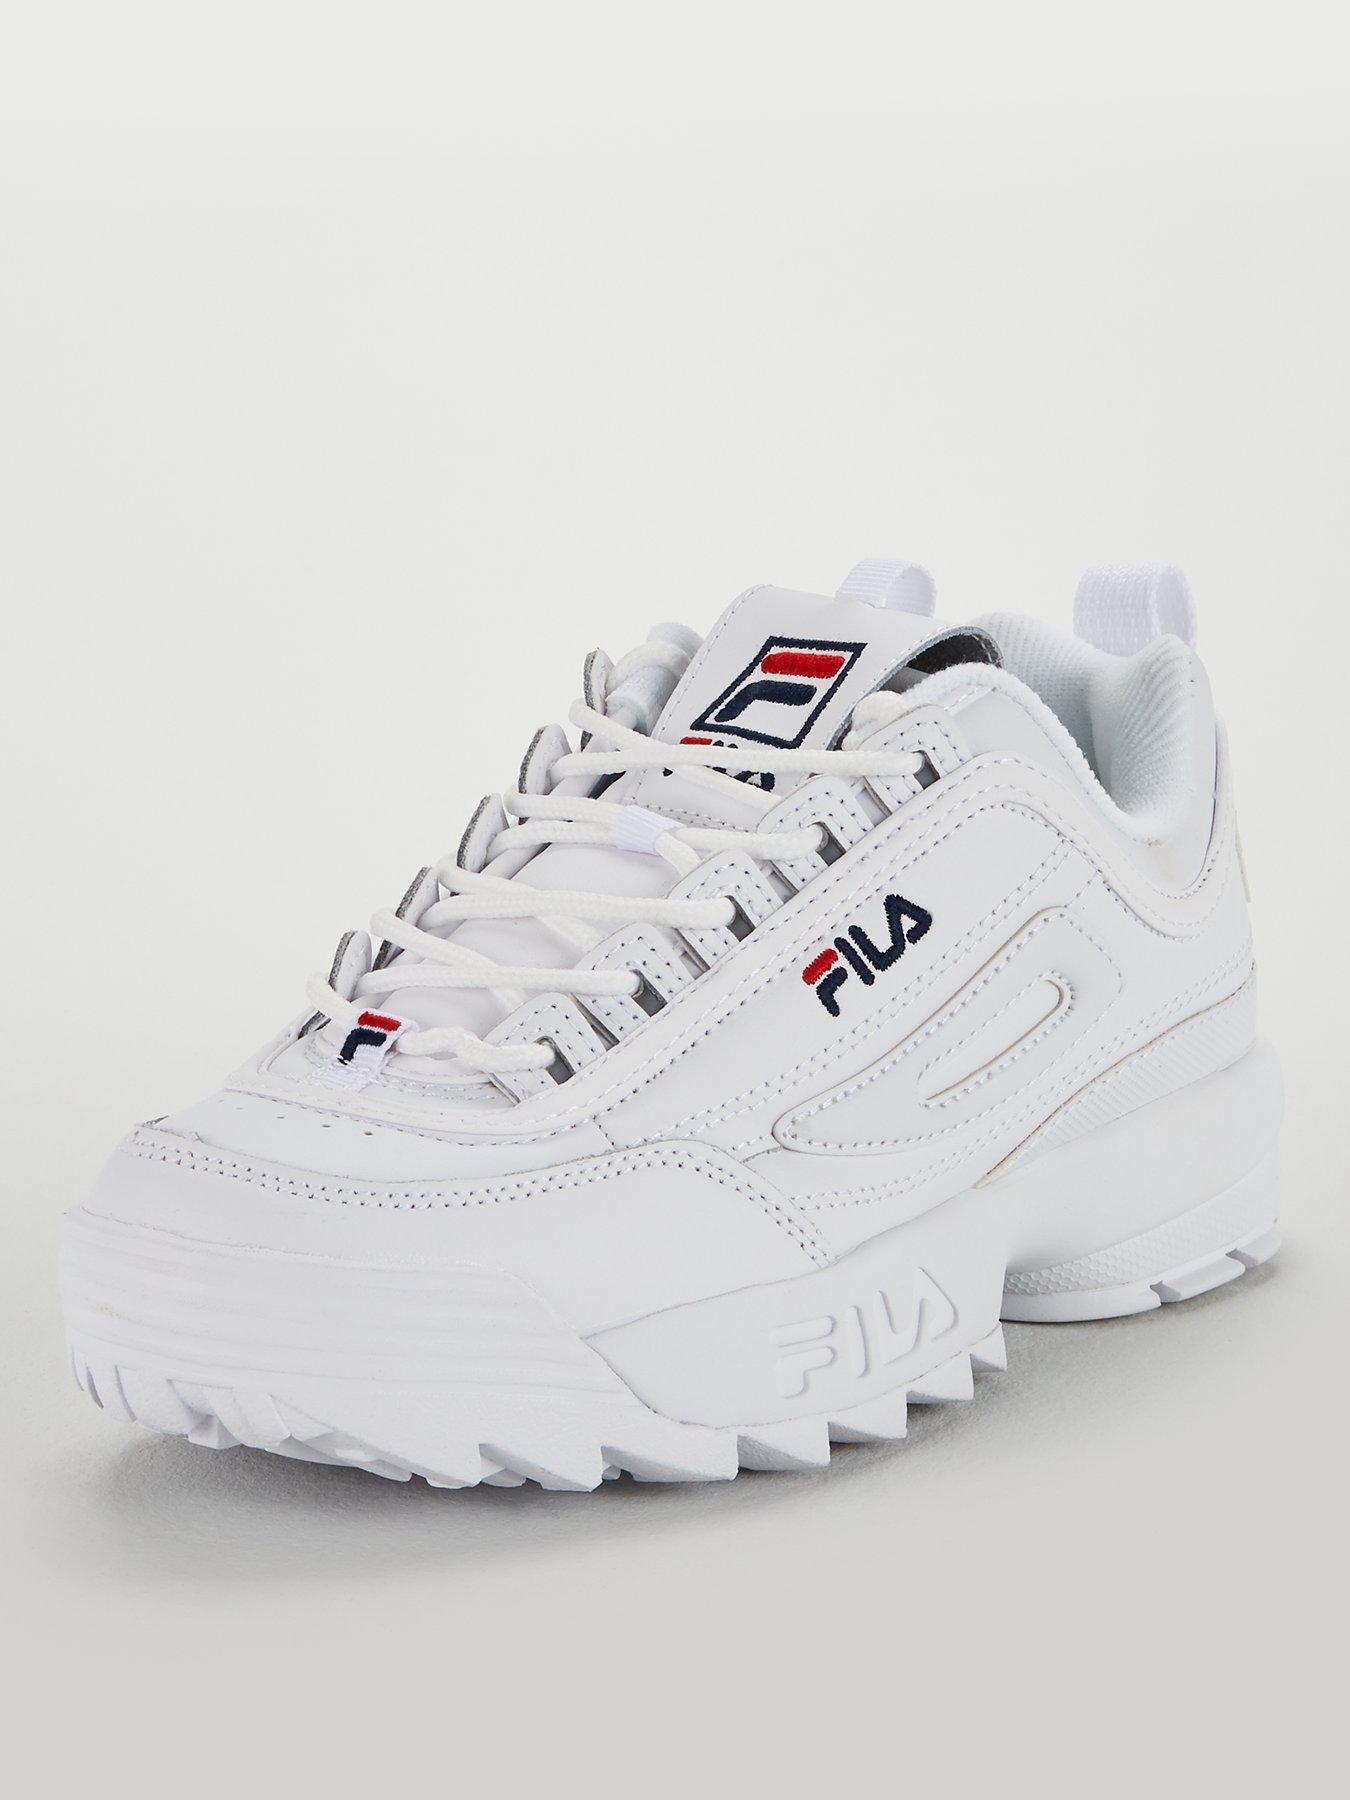 Fila Disruptor II - White | very.co.uk